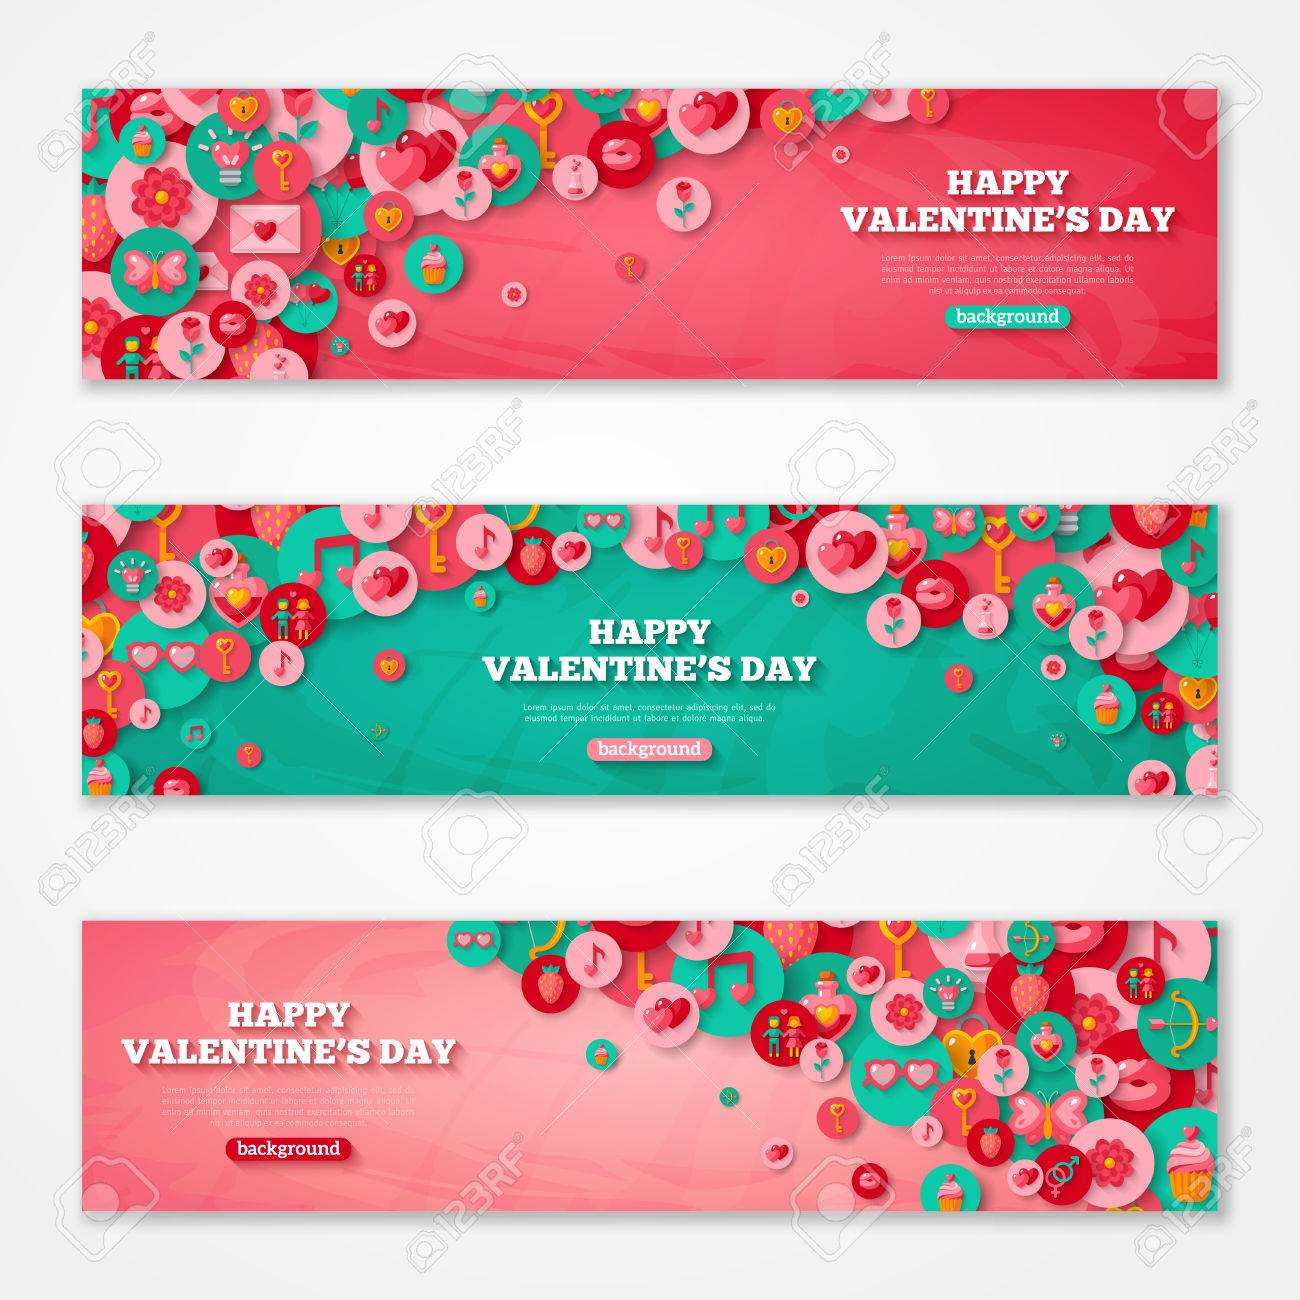 Valentines Horizontal Banners Set Flat Circle Icons. - 49611562